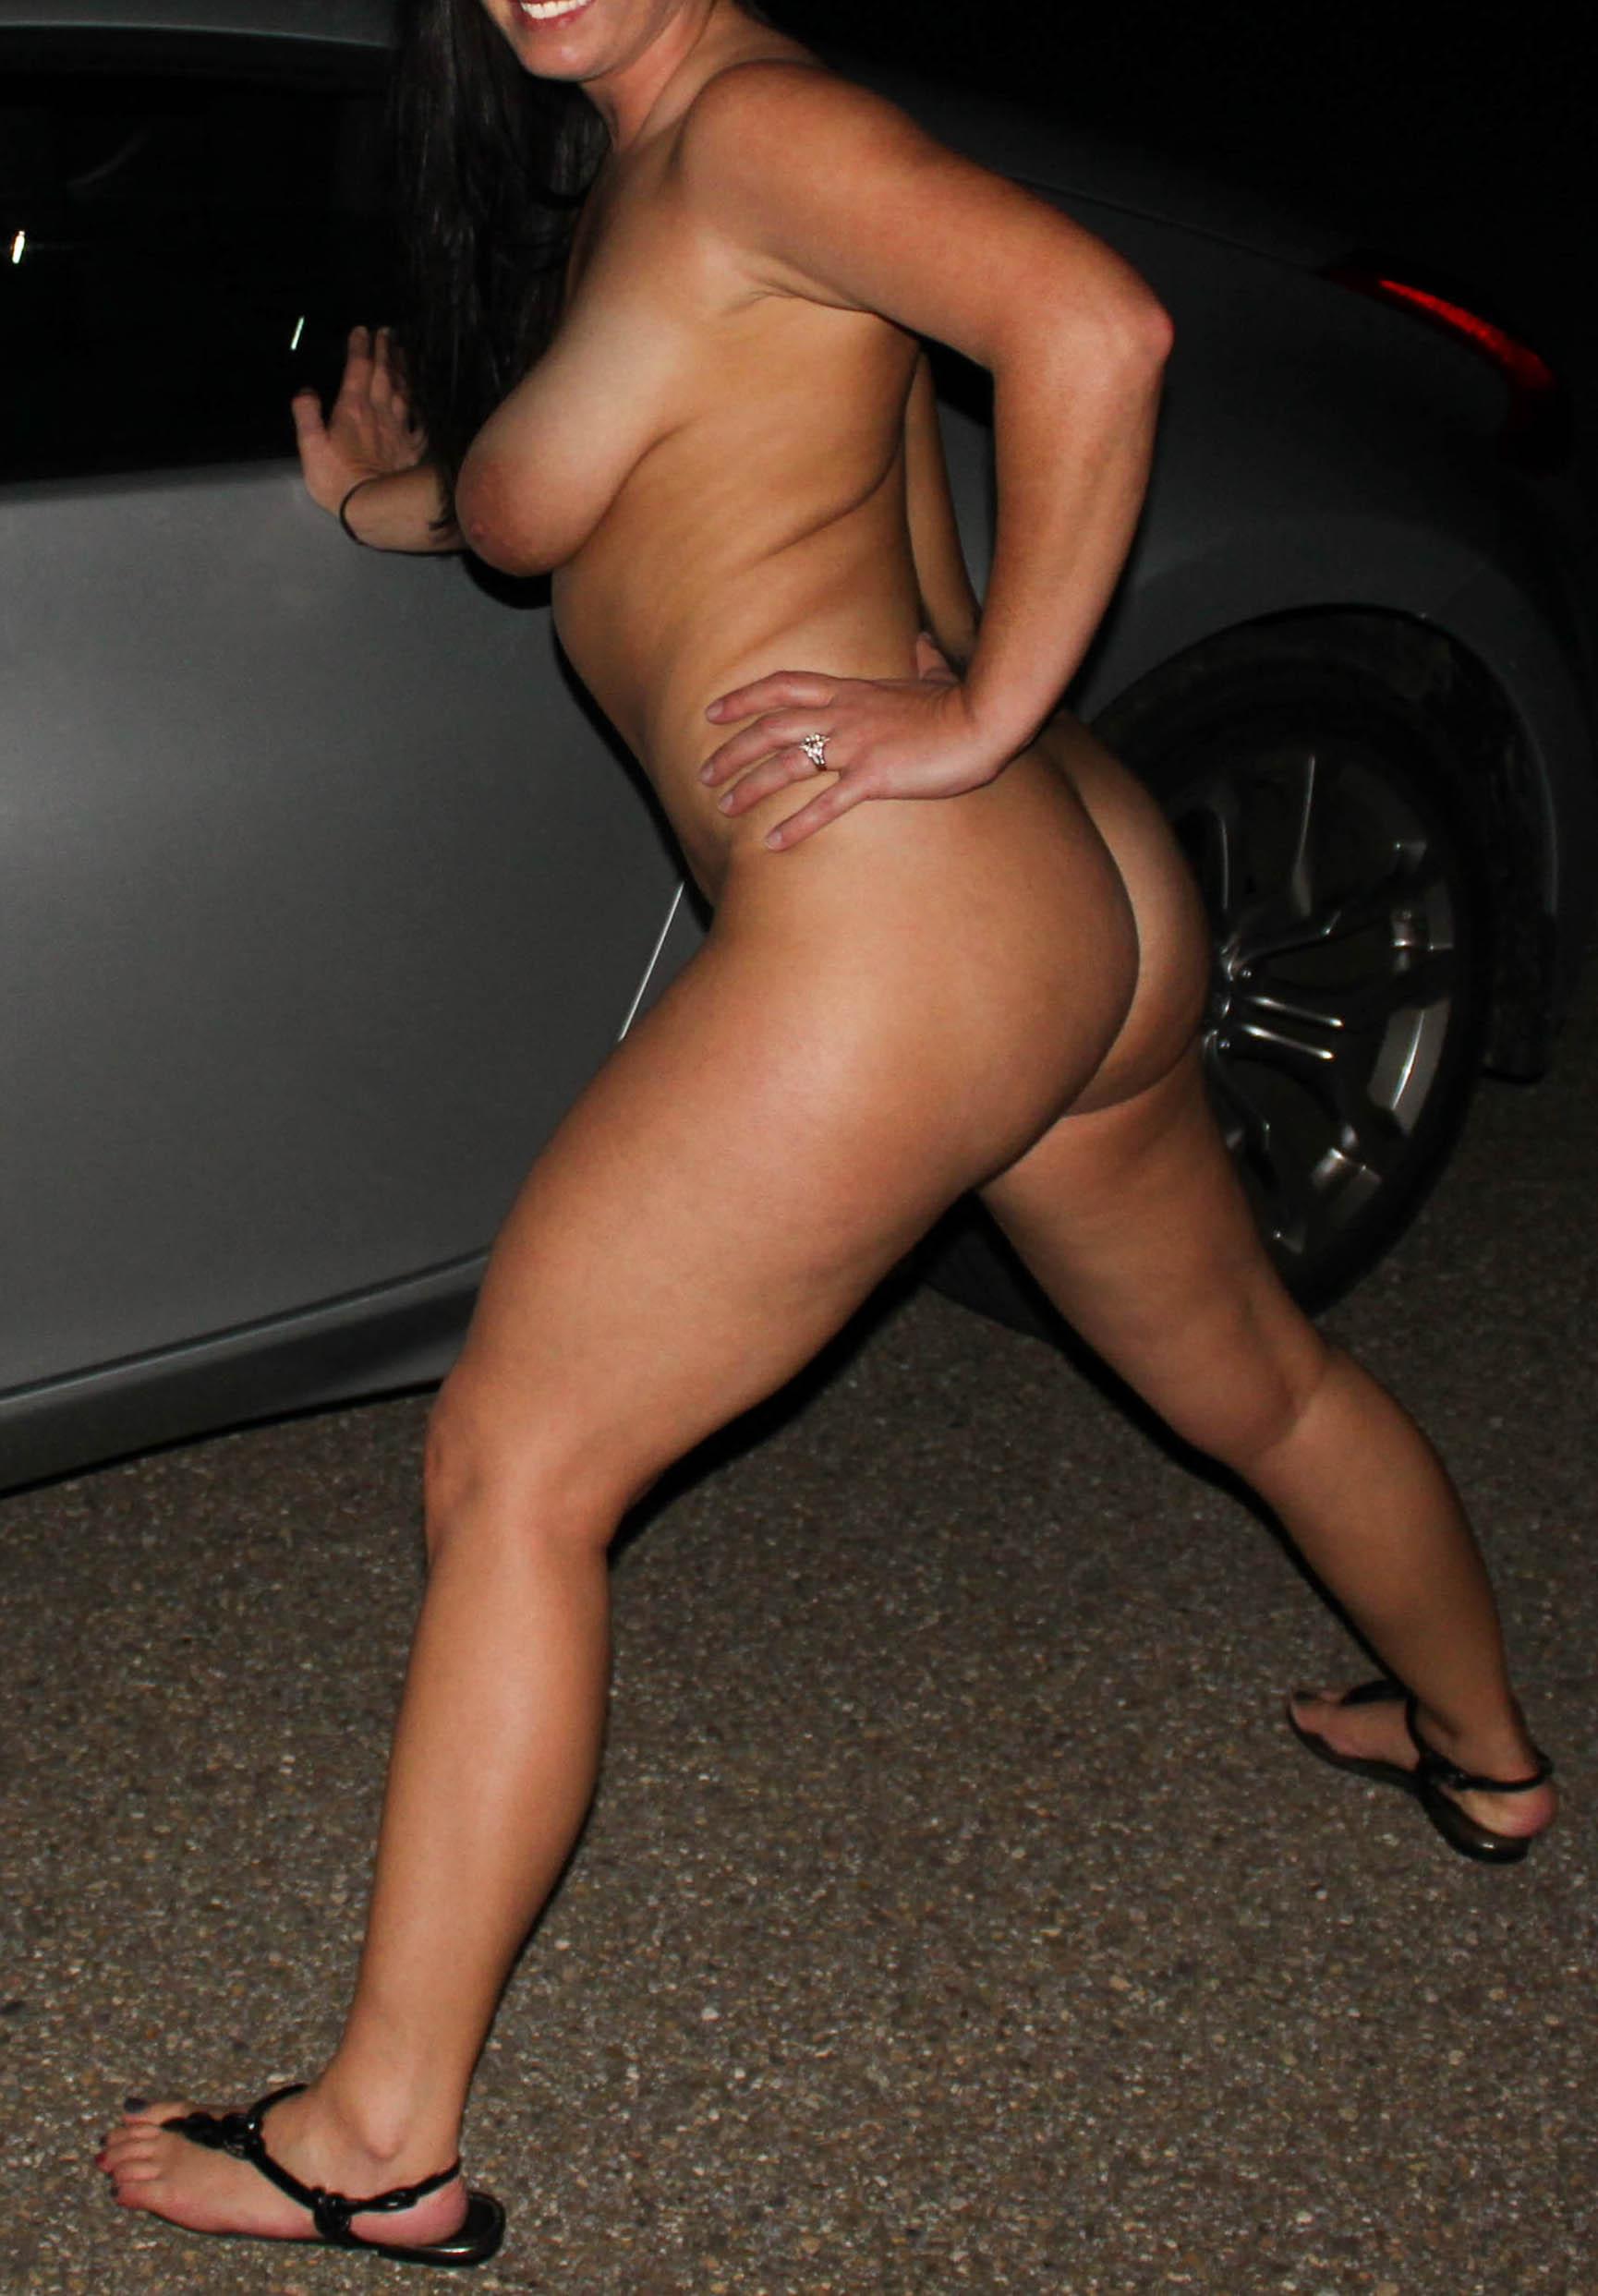 amateur hot wife porn pictures